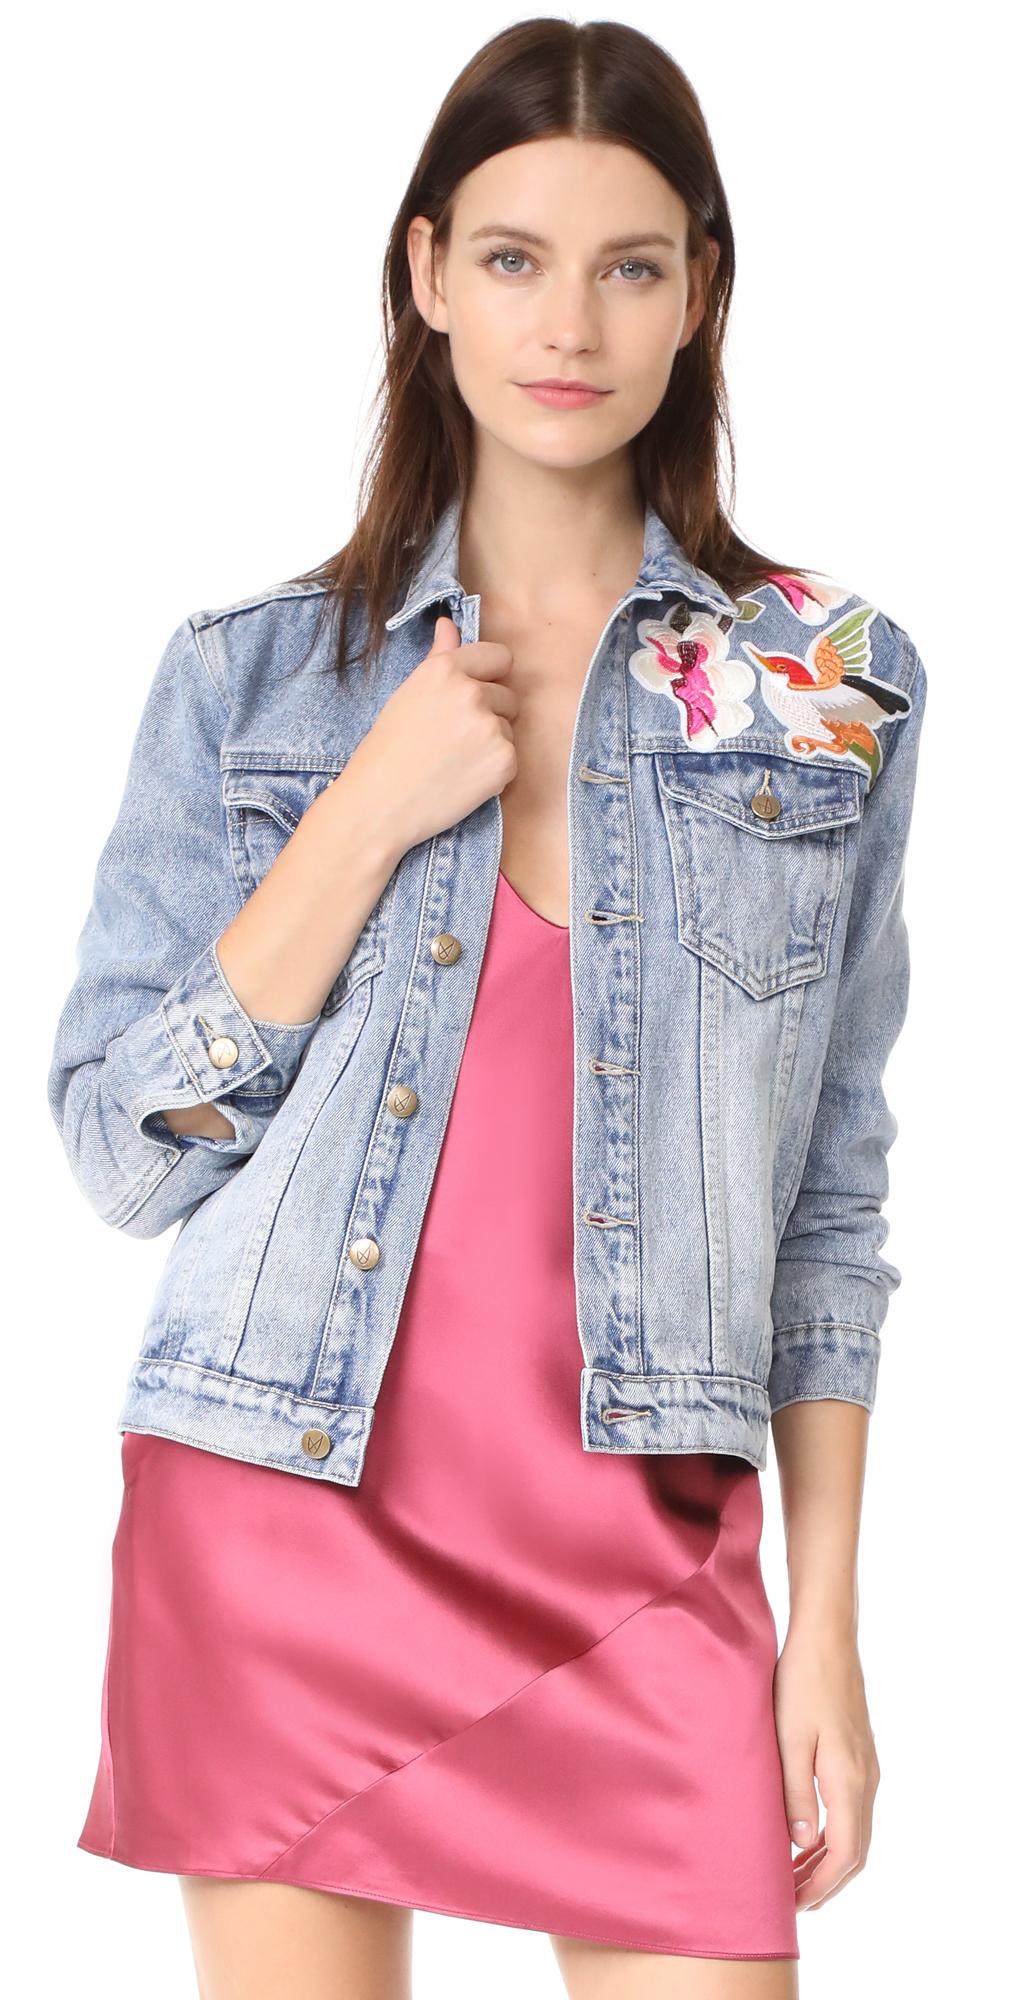 Blossom Patch Jacket MINKPINK